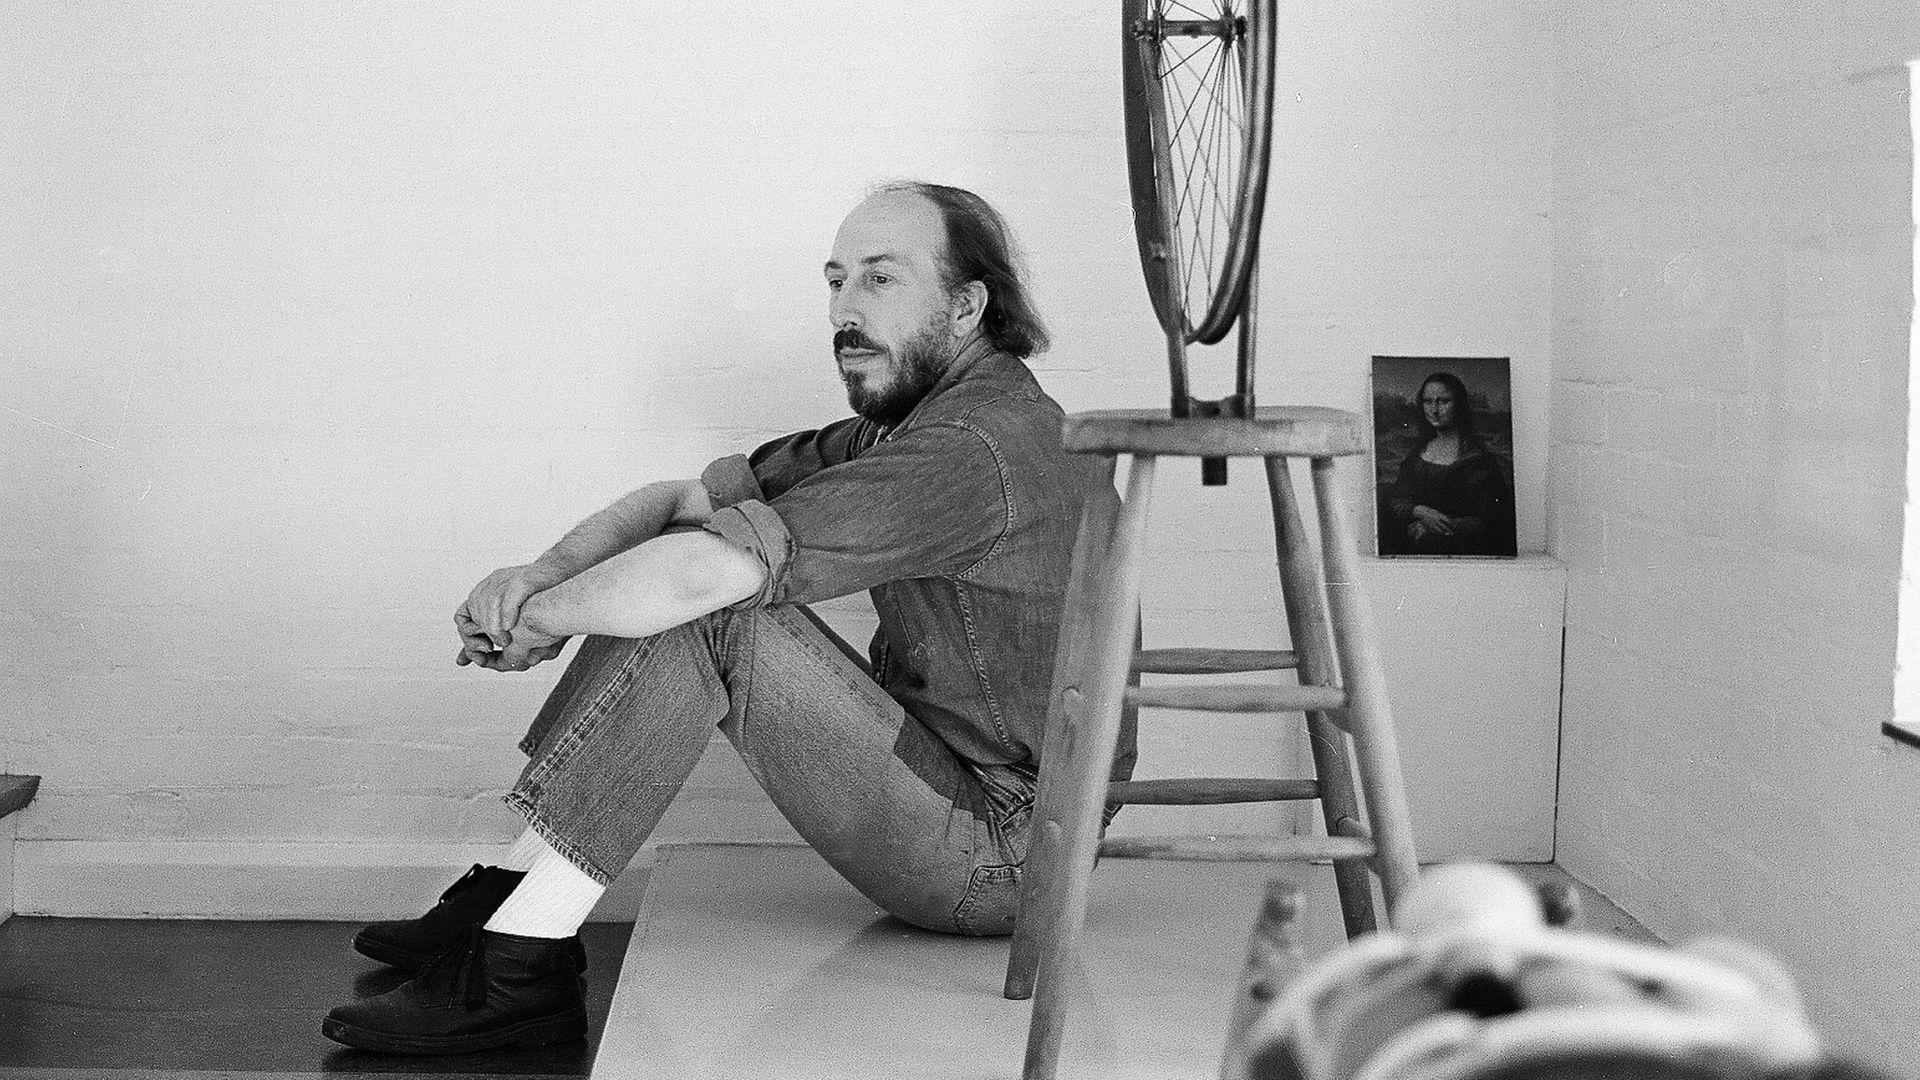 Richard Hamilton seated in his studio at 25 Hurst Avenue in Highgate in London circa 1970 - Credit: Redferns